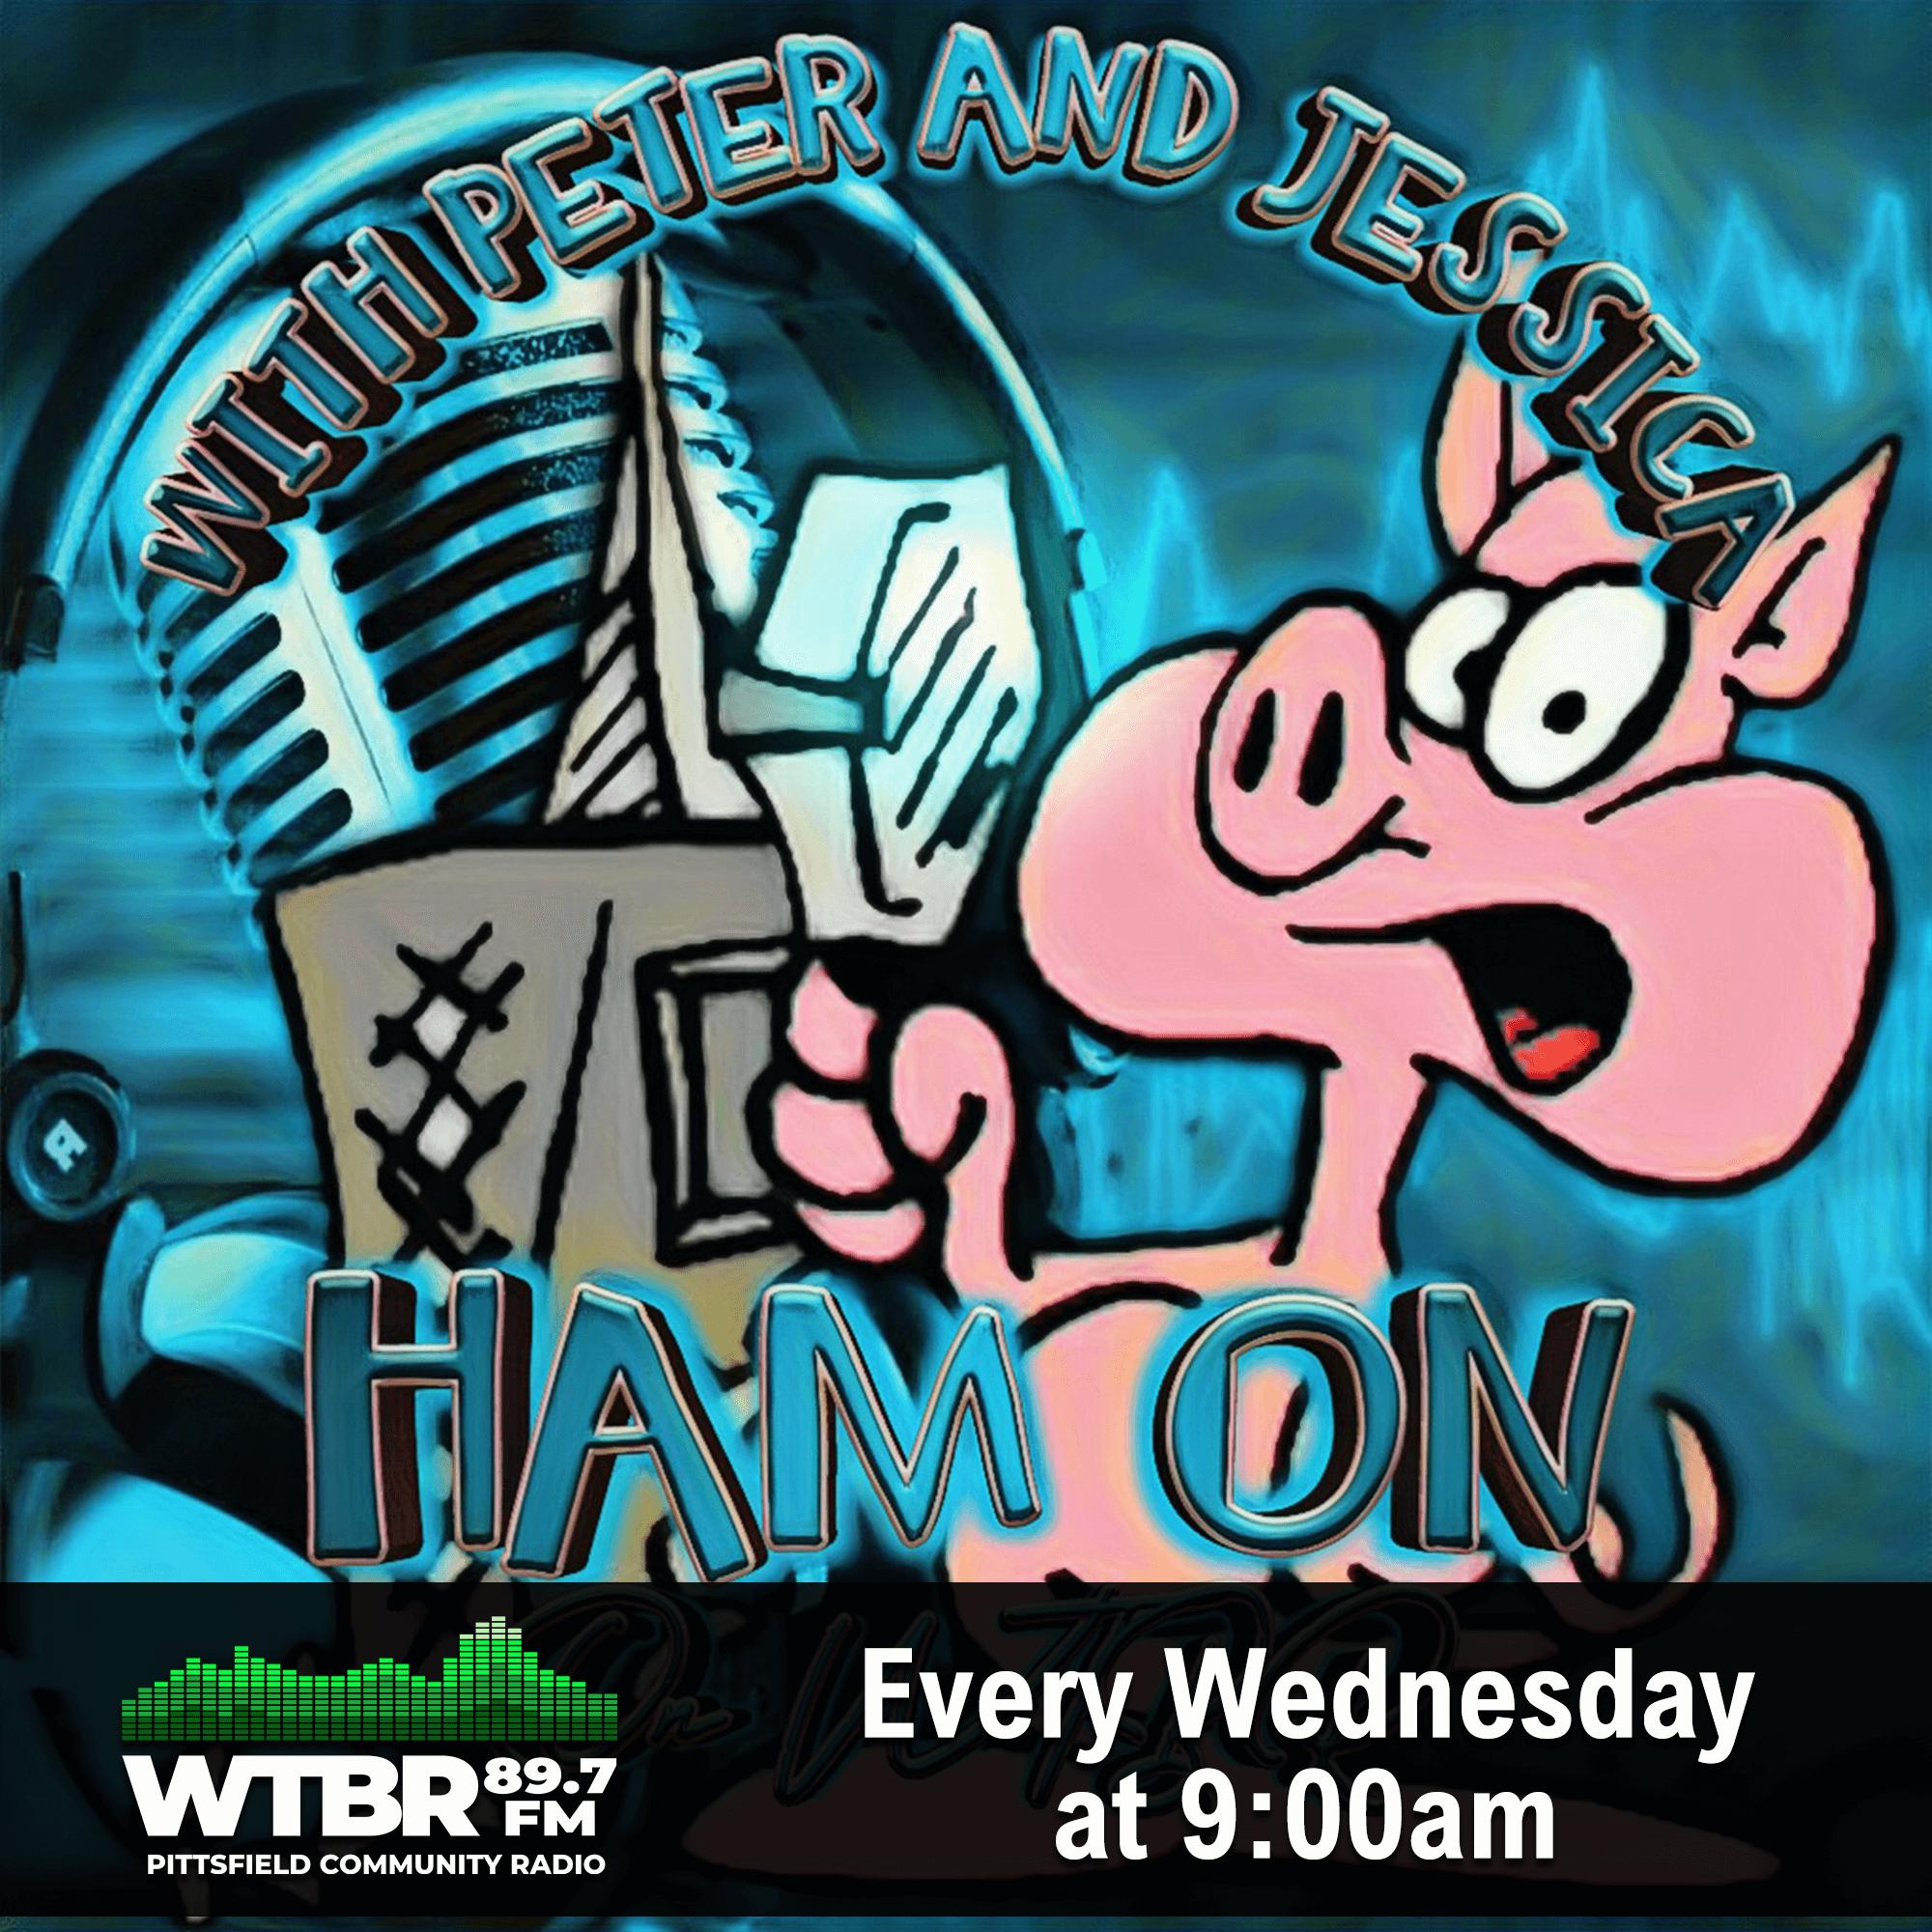 WTBR-FM Highlights